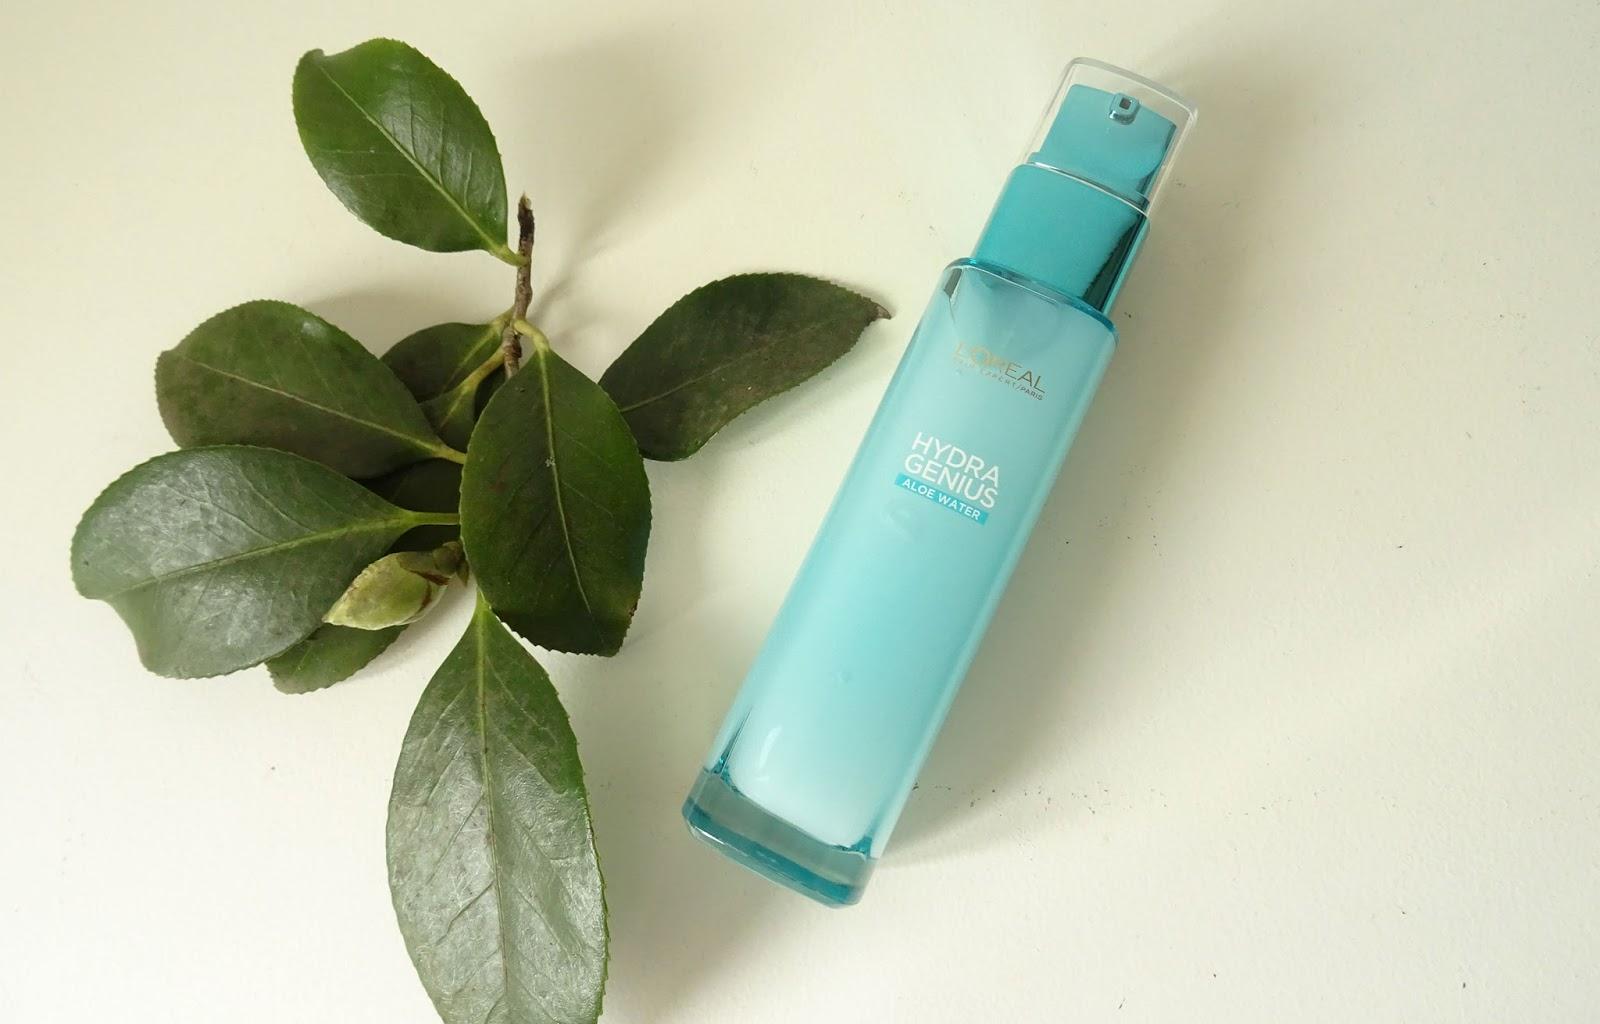 Hydra Genius Aloe Water soin liquide hydratant L'Oréal